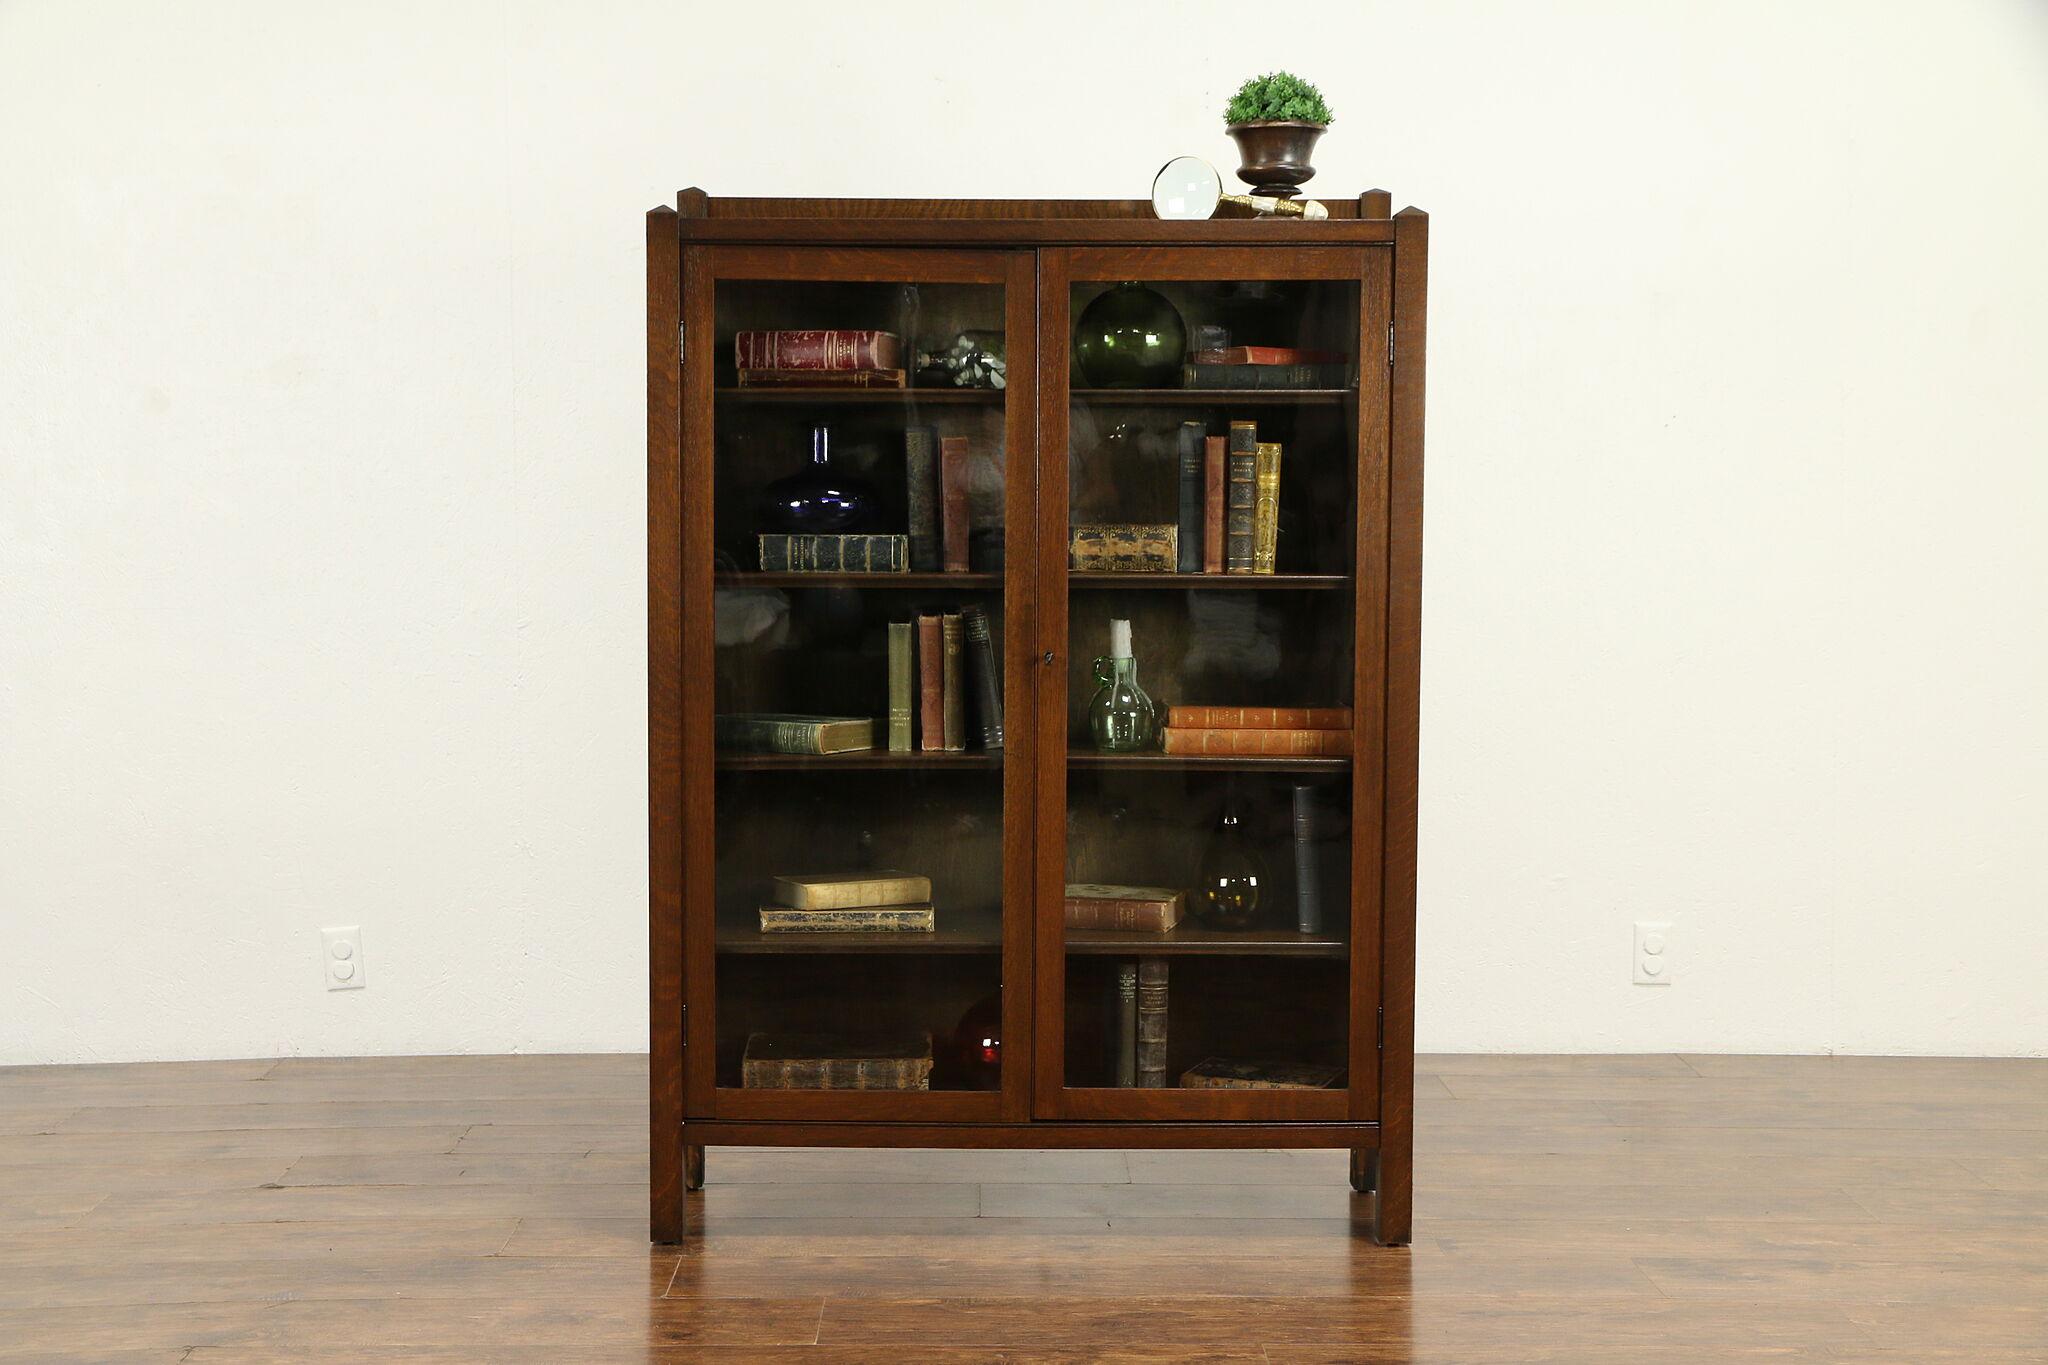 Art Crafts Mission Oak Antique Craftsman Bookcase Wavy Glass Doors 31728